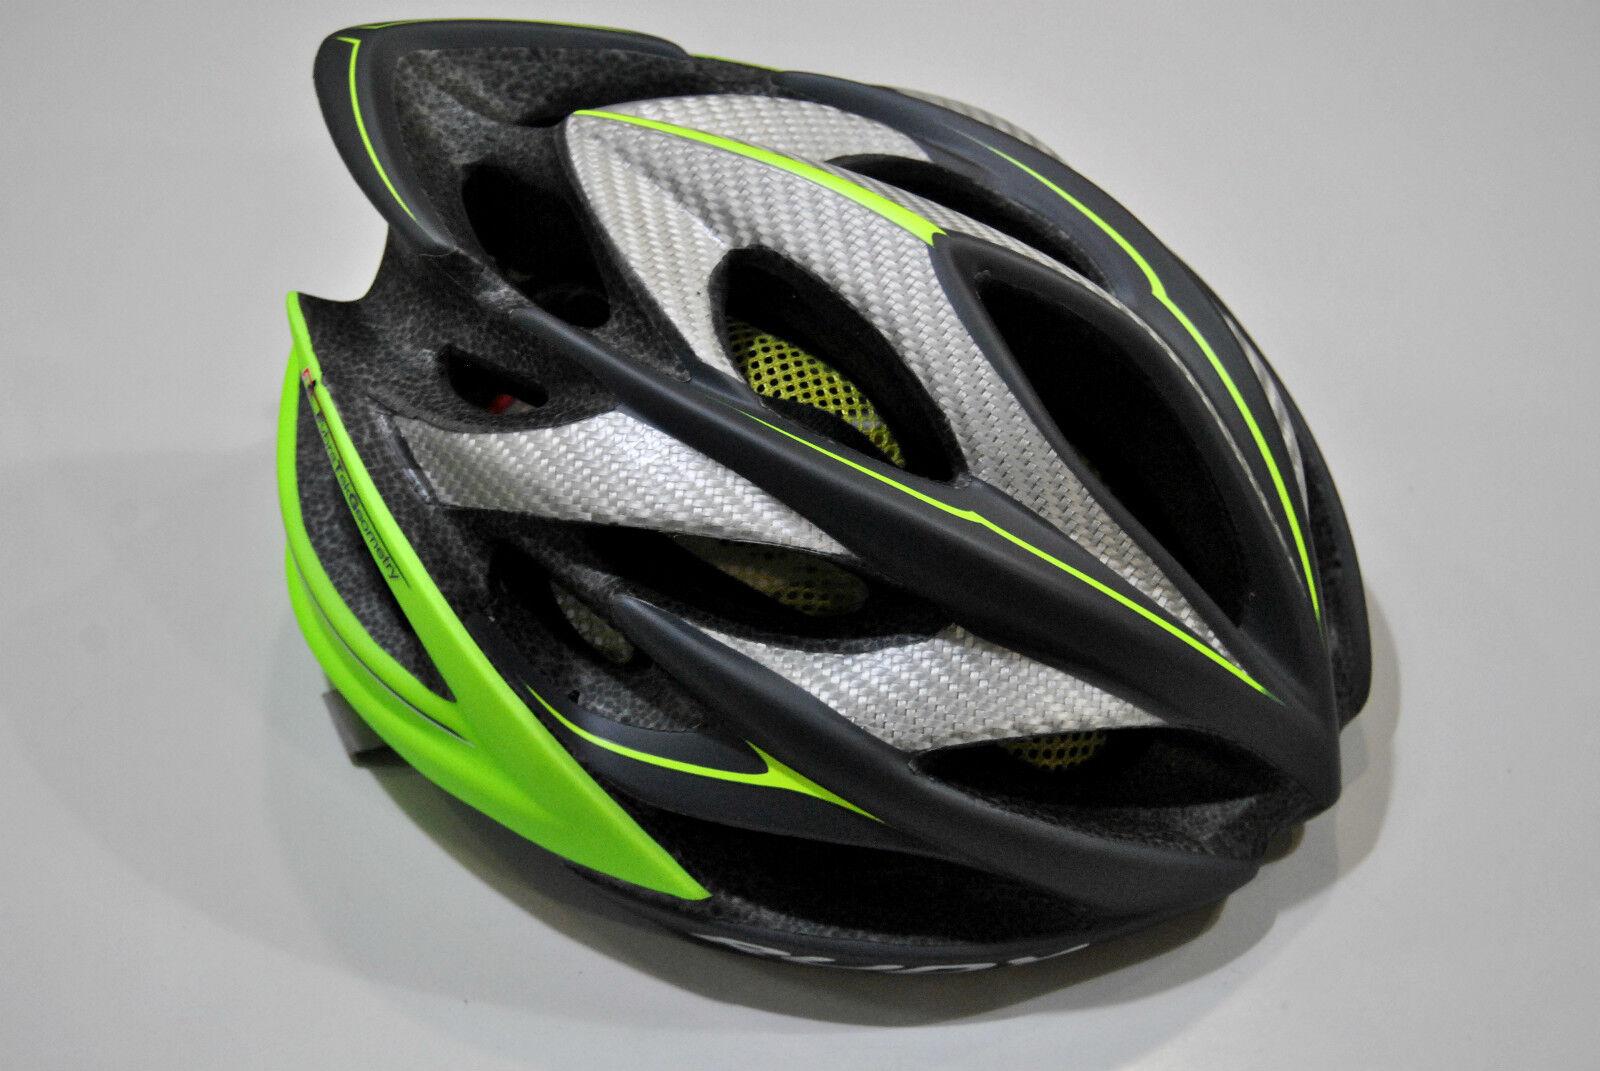 Helm mit dem Fahrrad Fahrrad Fahrrad RUDY Projekt MOD. WINDMAX Kol. Graphit Lime Fluo Mat HELMET f98567